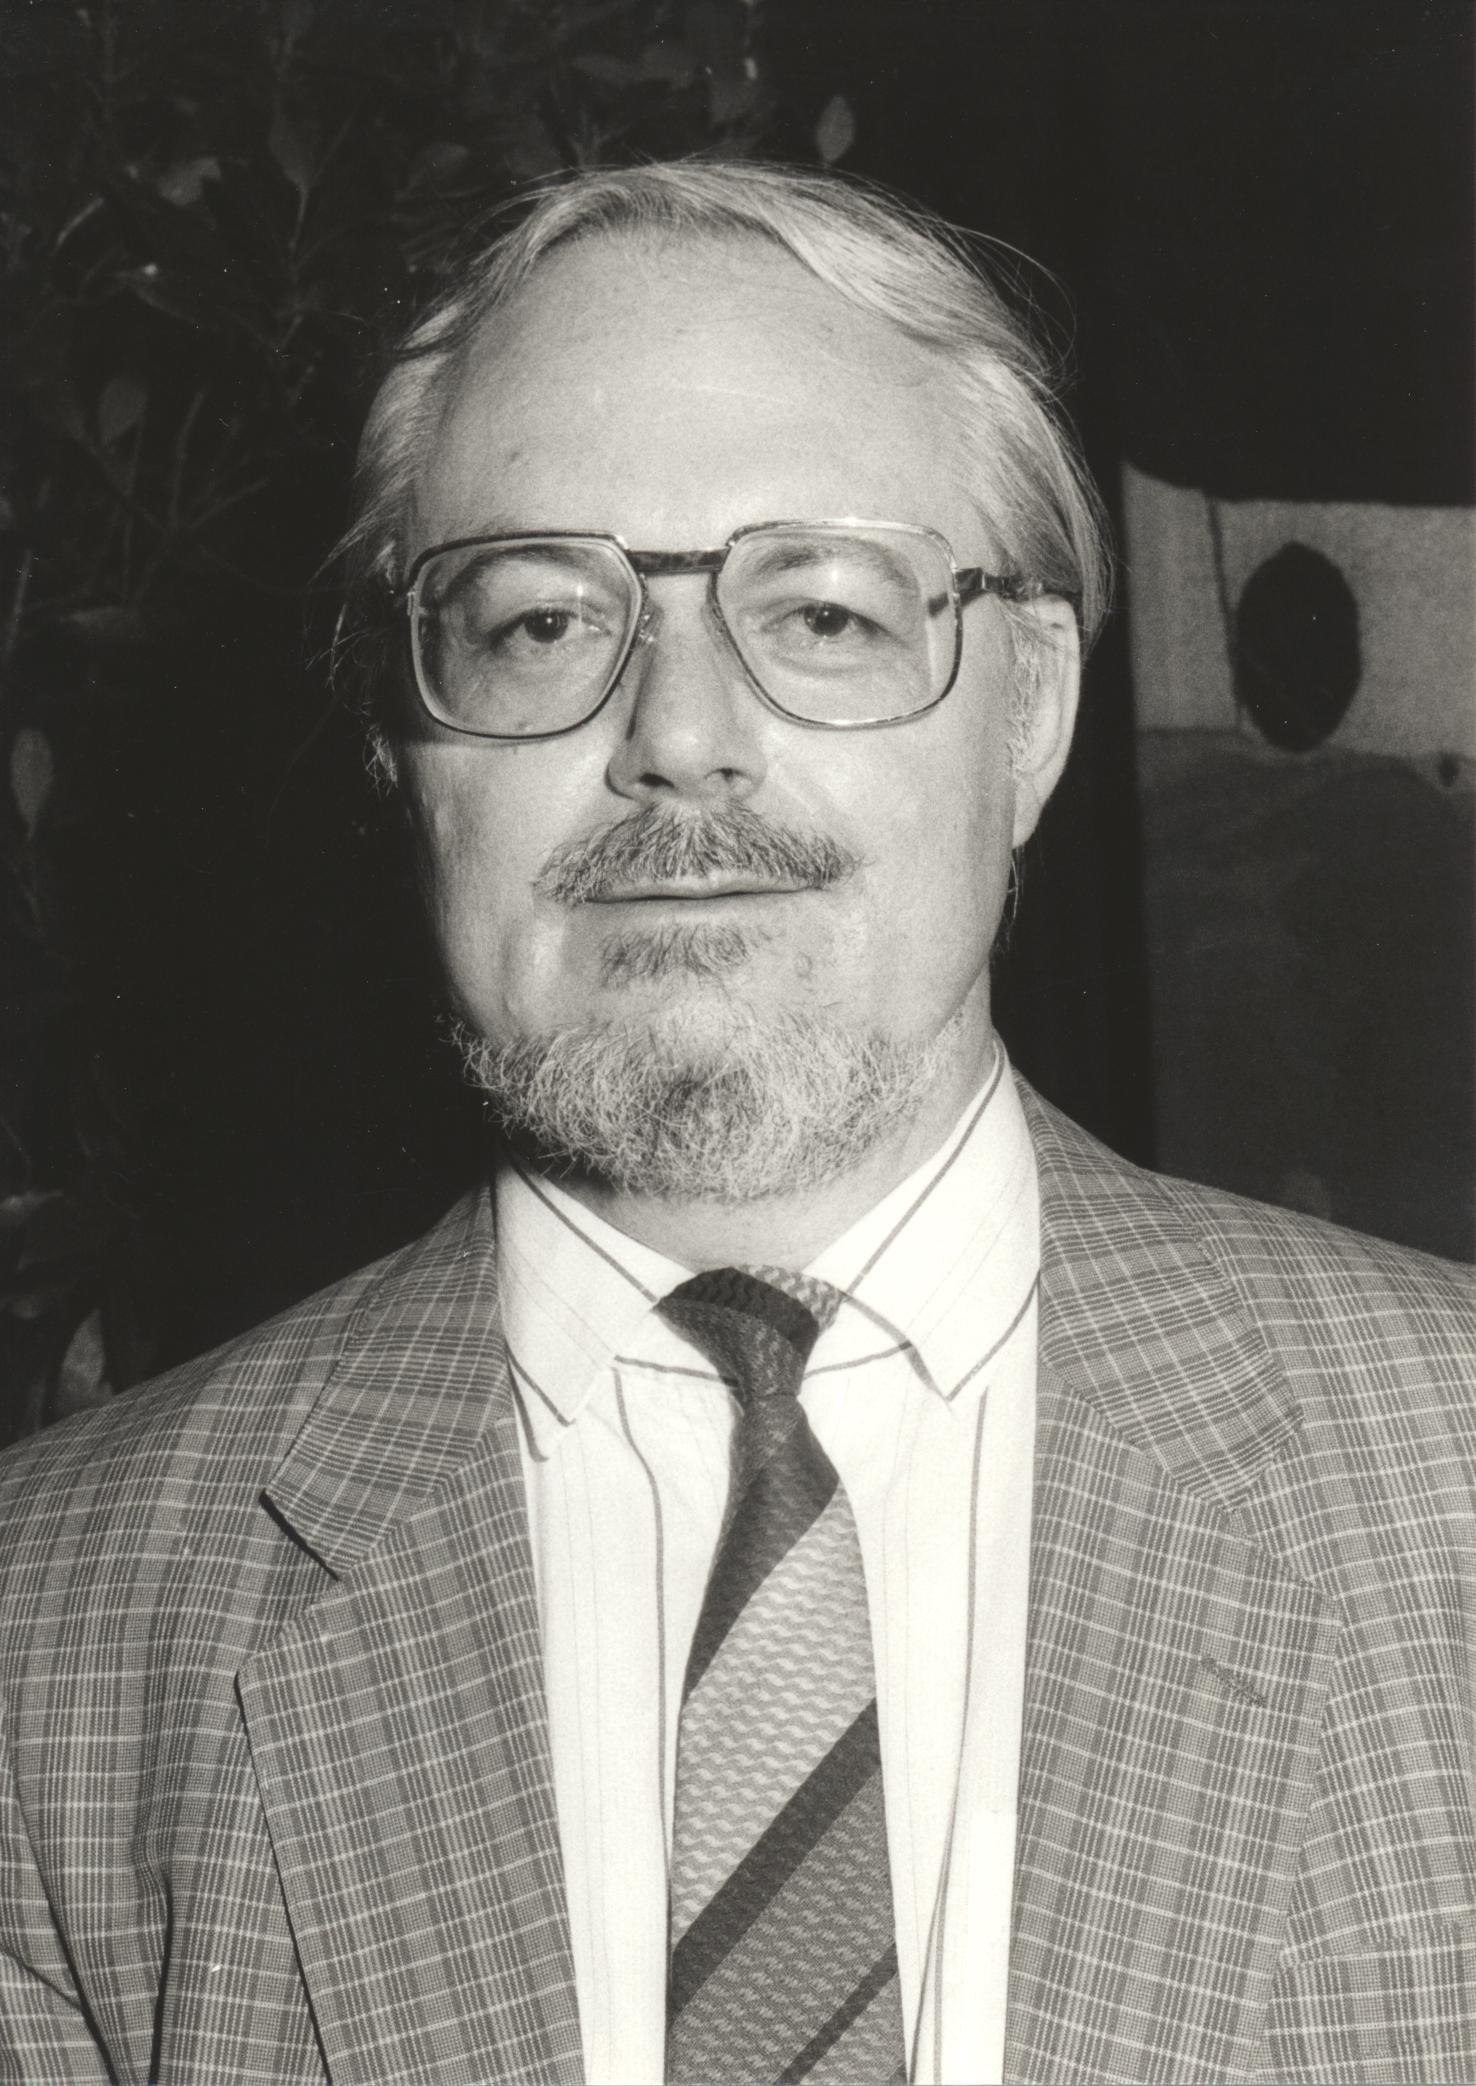 XIII. Imago Mundi-Kongress 1991, Innsbruck, Dipl.-Phys. Illobrand von Ludwiger